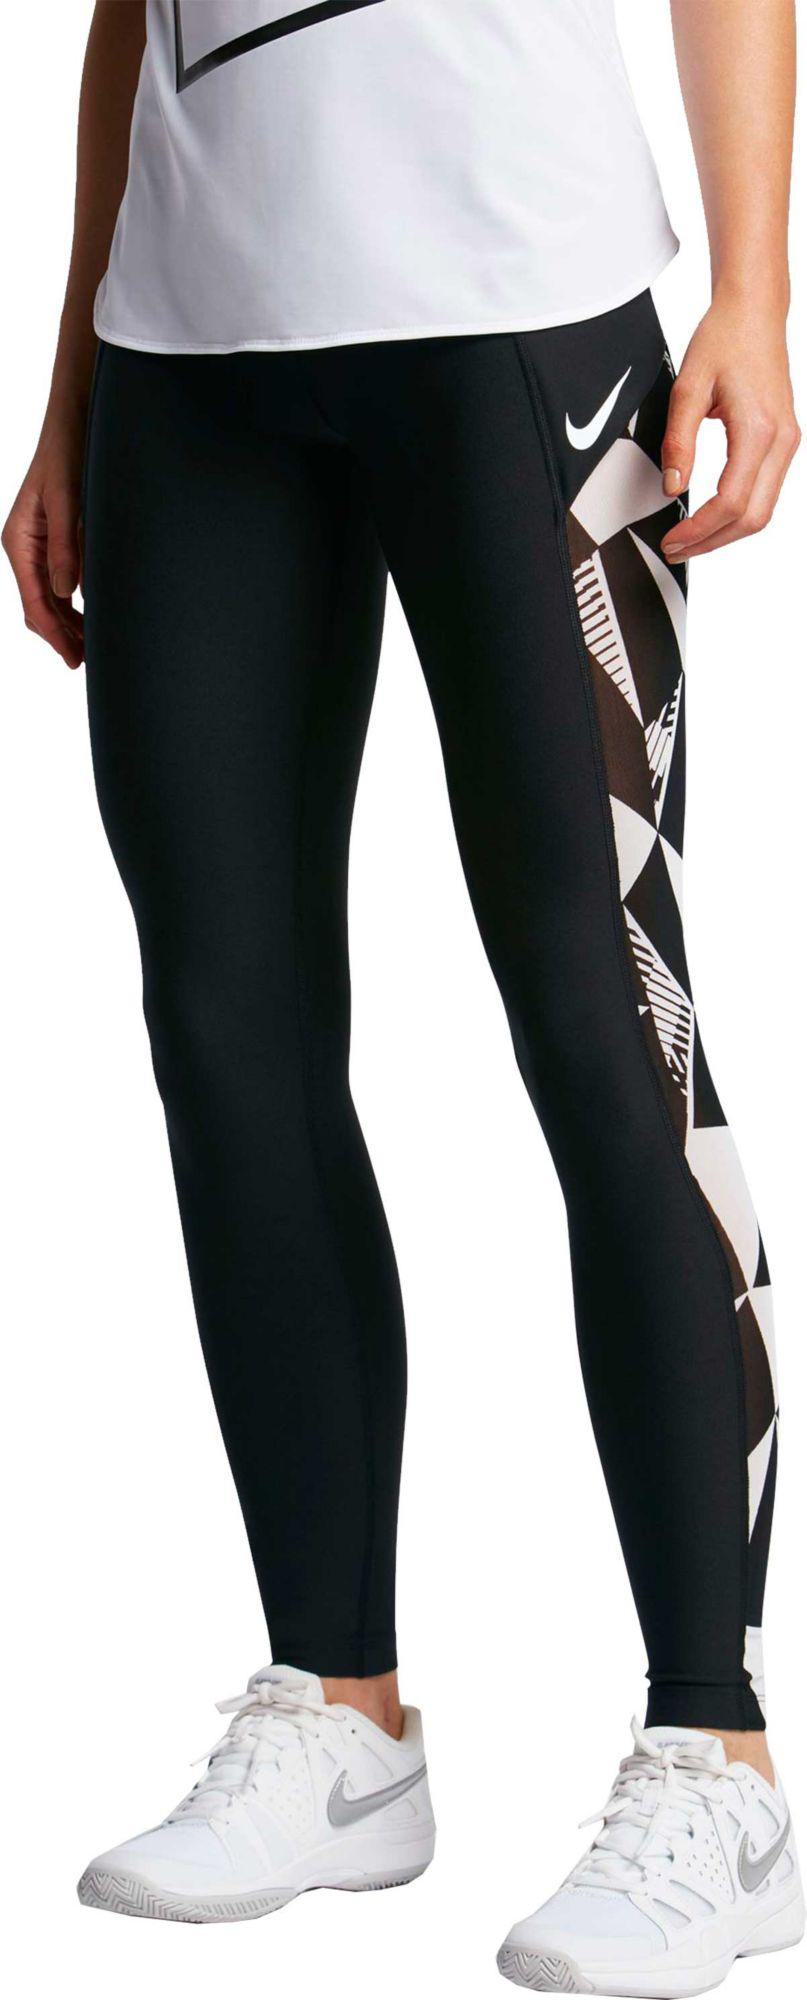 Lyst - Nike Court Baseline Tennis Leggings in Black bc4bb2ce431